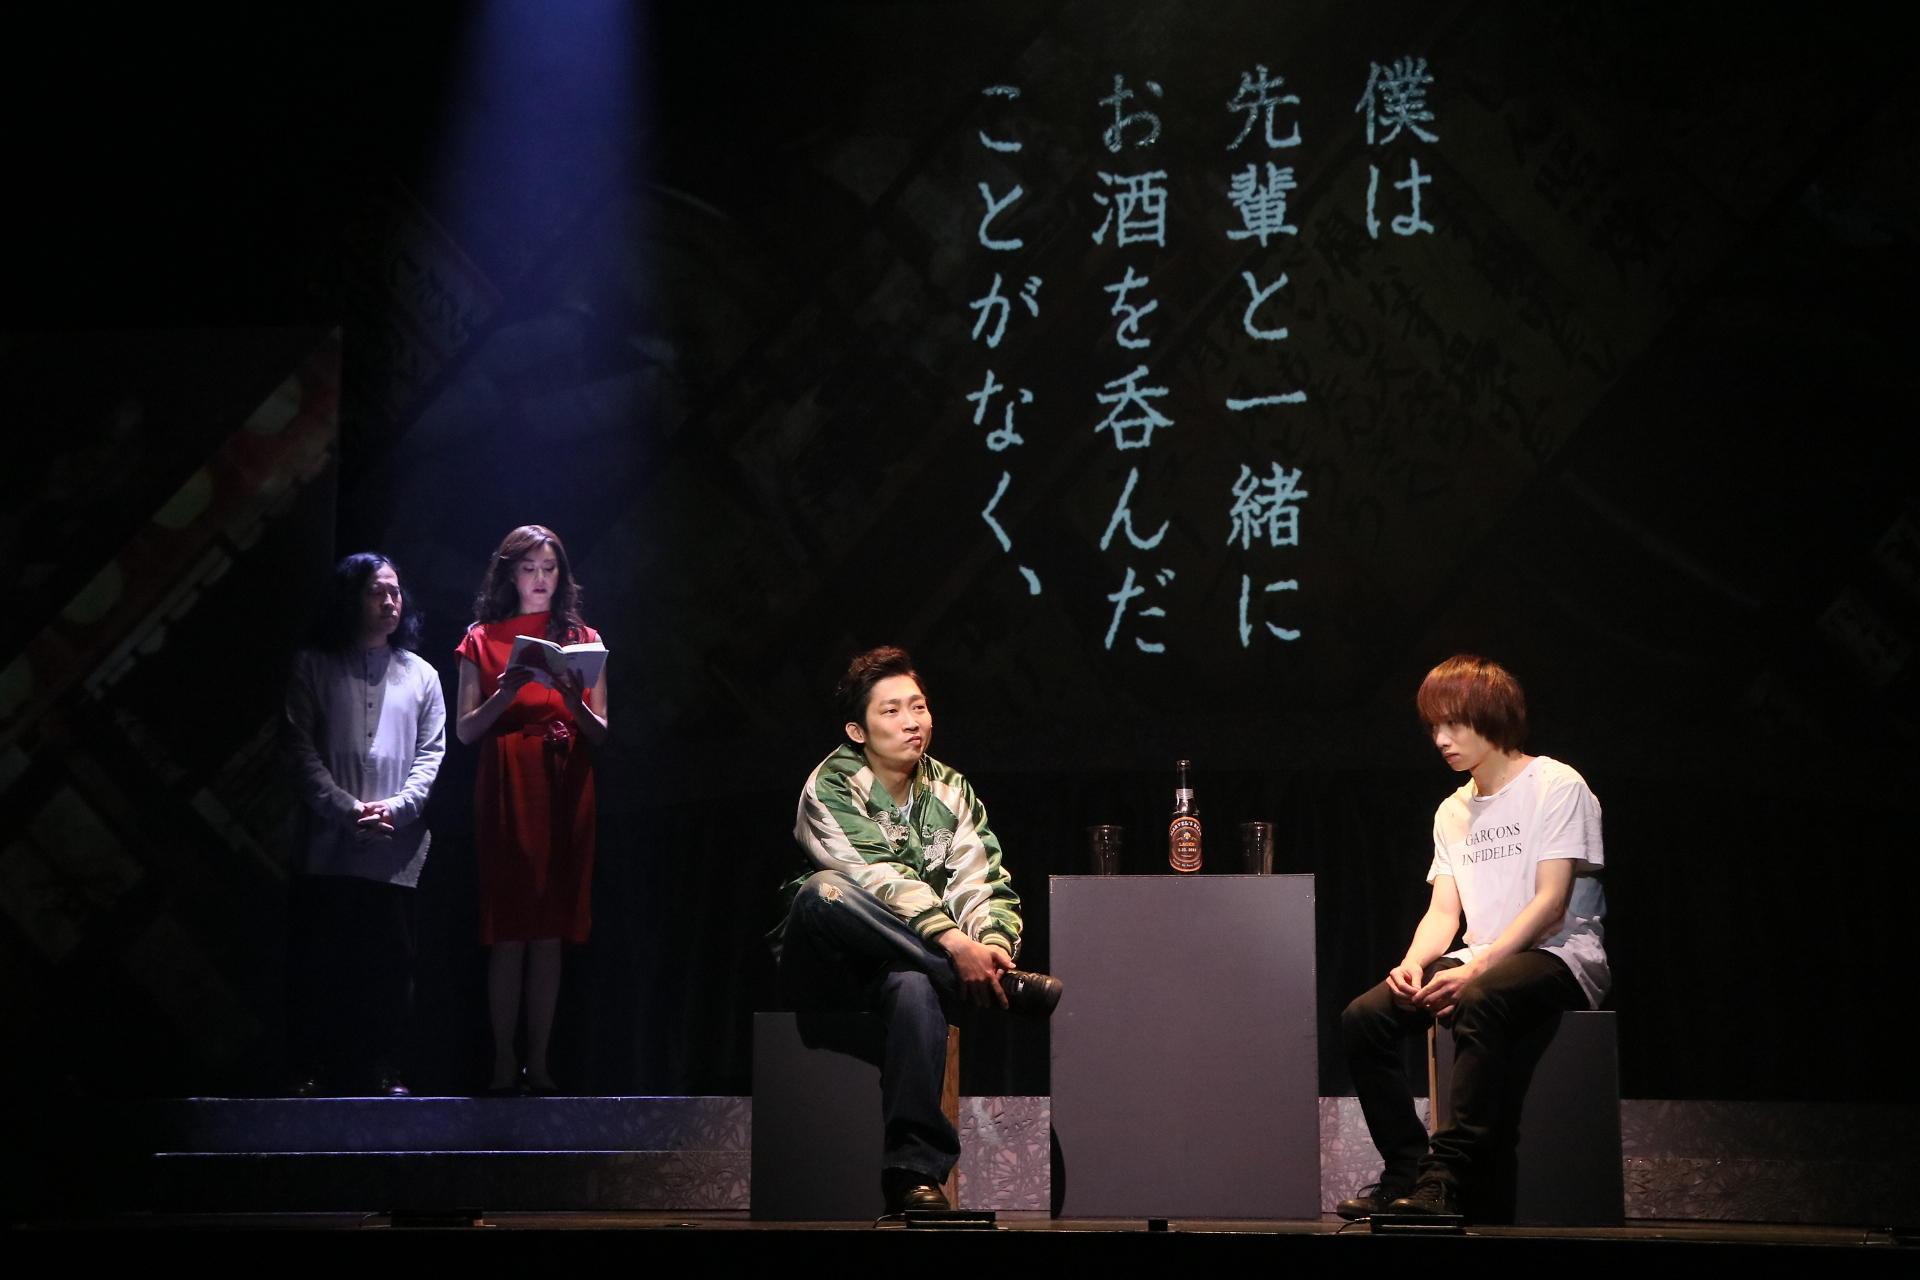 http://news.yoshimoto.co.jp/20180330224958-36207e3594259a50da75c2488d3bdde9d9b9ca8e.jpg